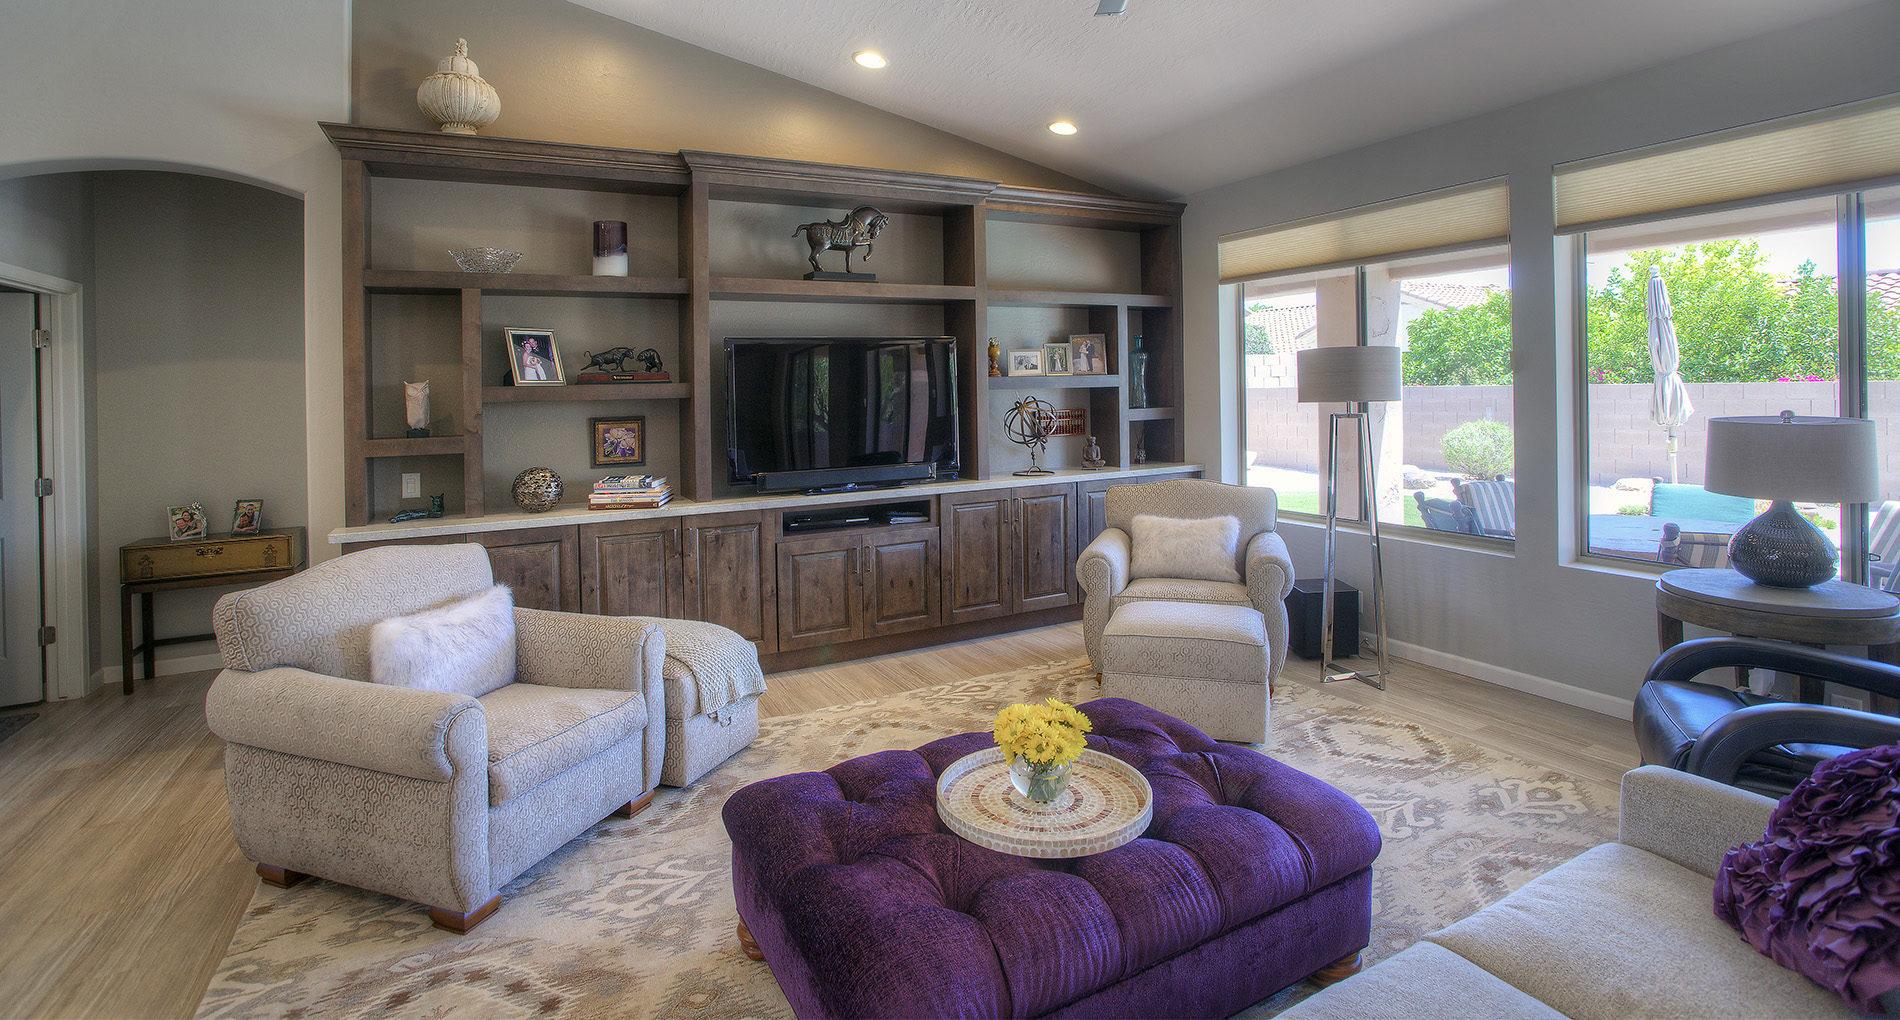 Home Remodel Phoenix Calledevalle Slider